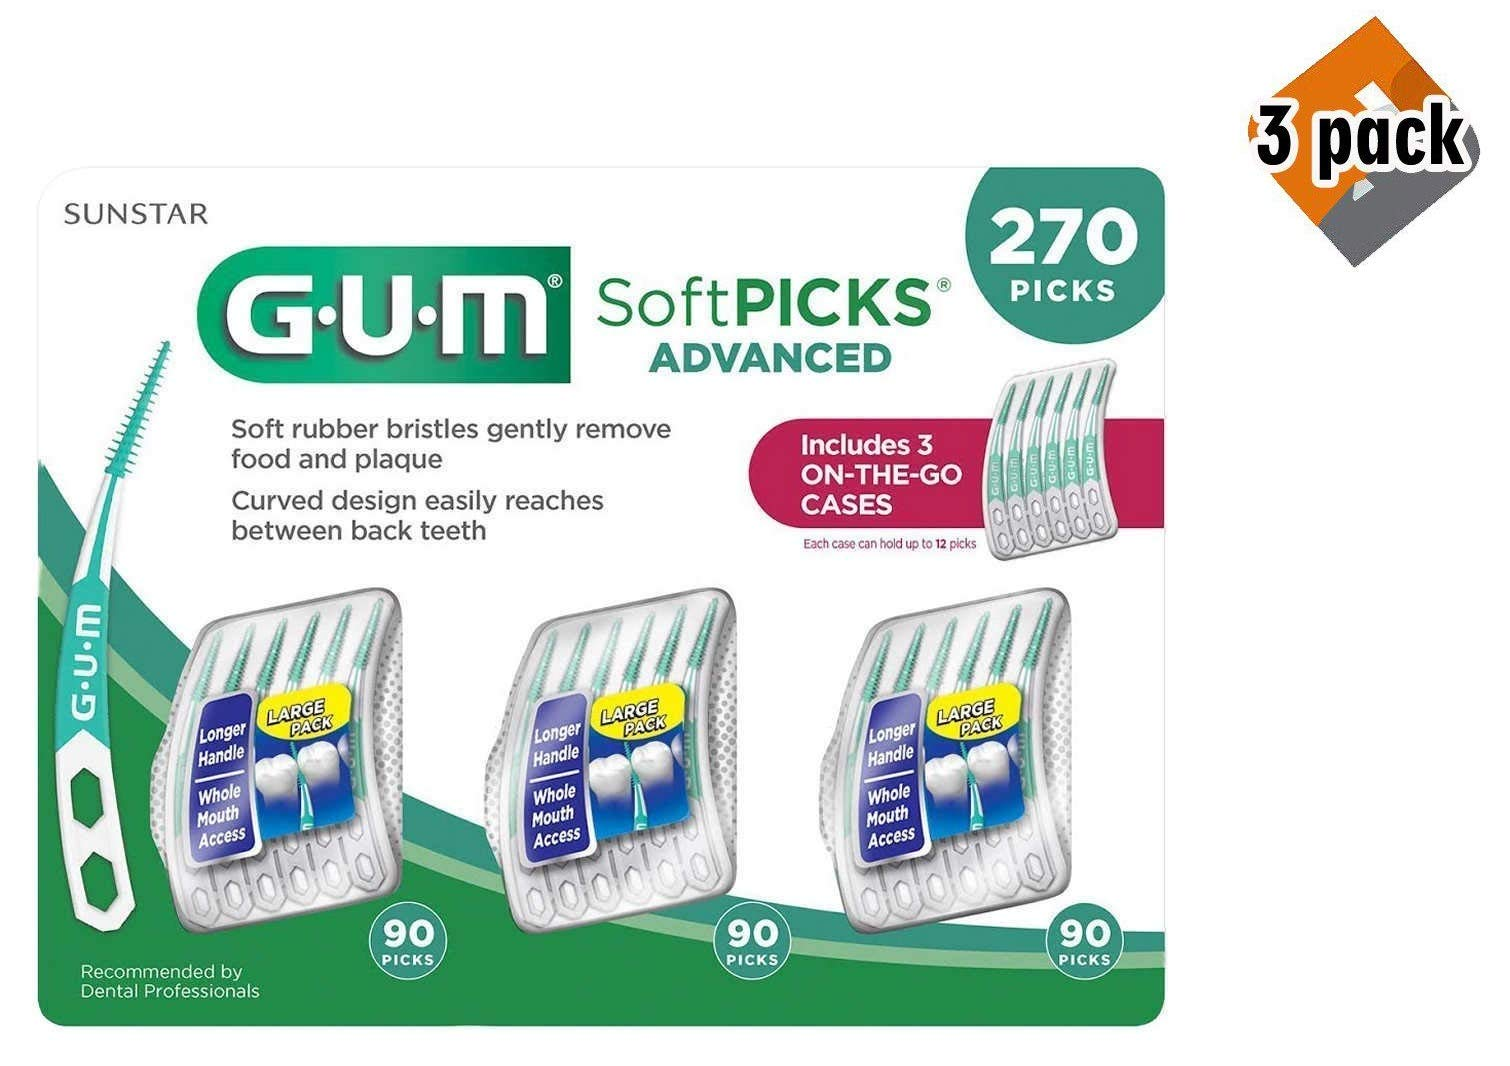 GUM Soft-Picks Advanced Dental Picks, 270 Count - 3 Pack